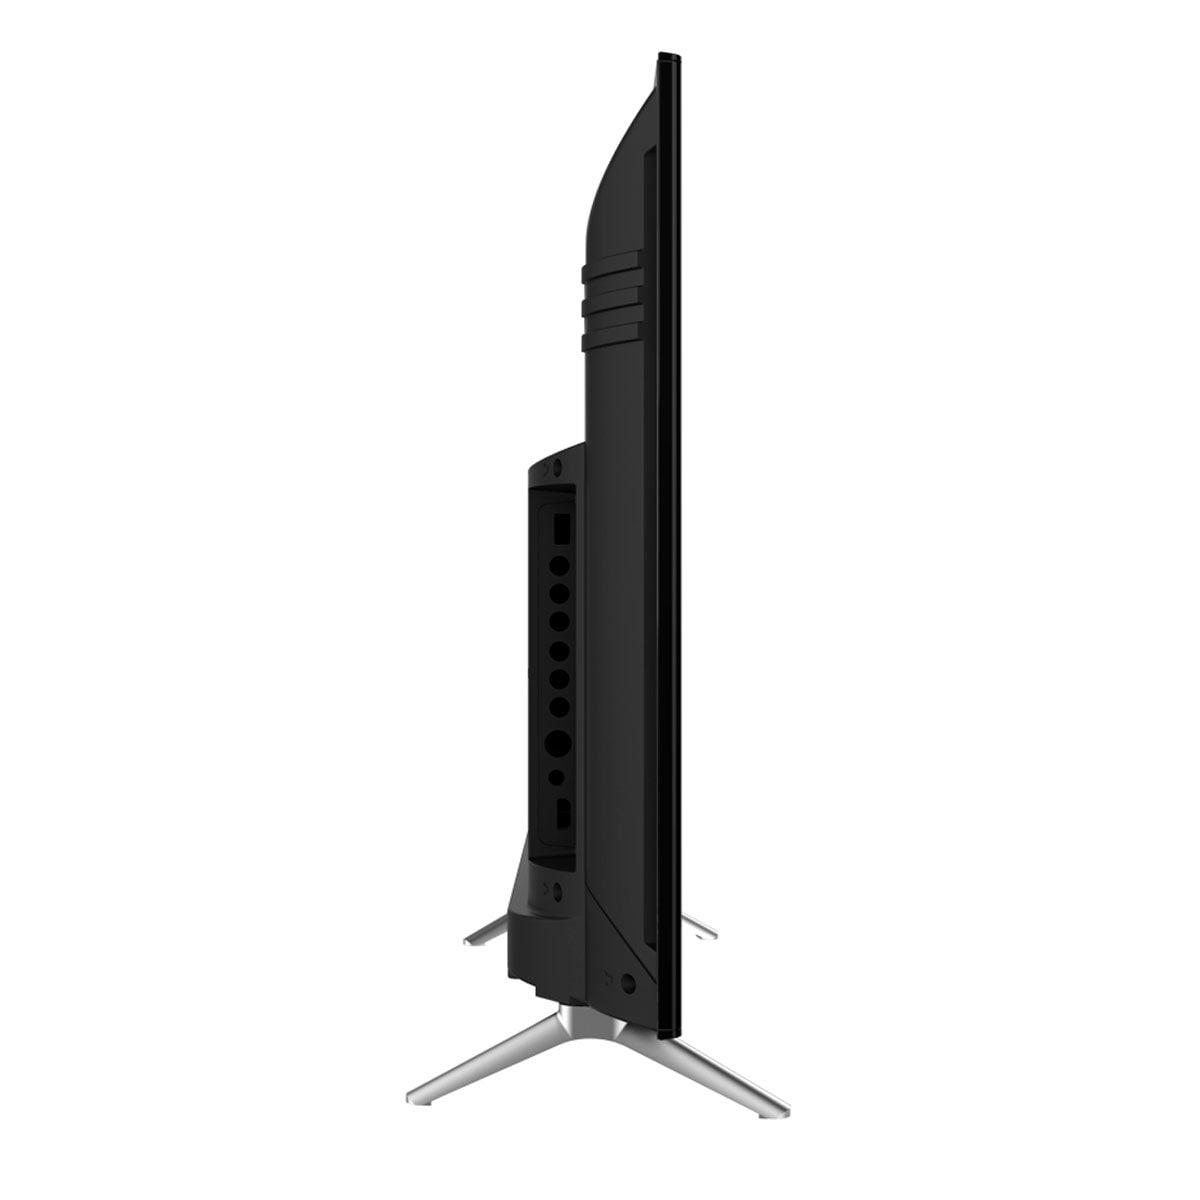 "Pantalla Tcl 32"" Led Hd Smart+ Roku Mod.32S305-Mx"